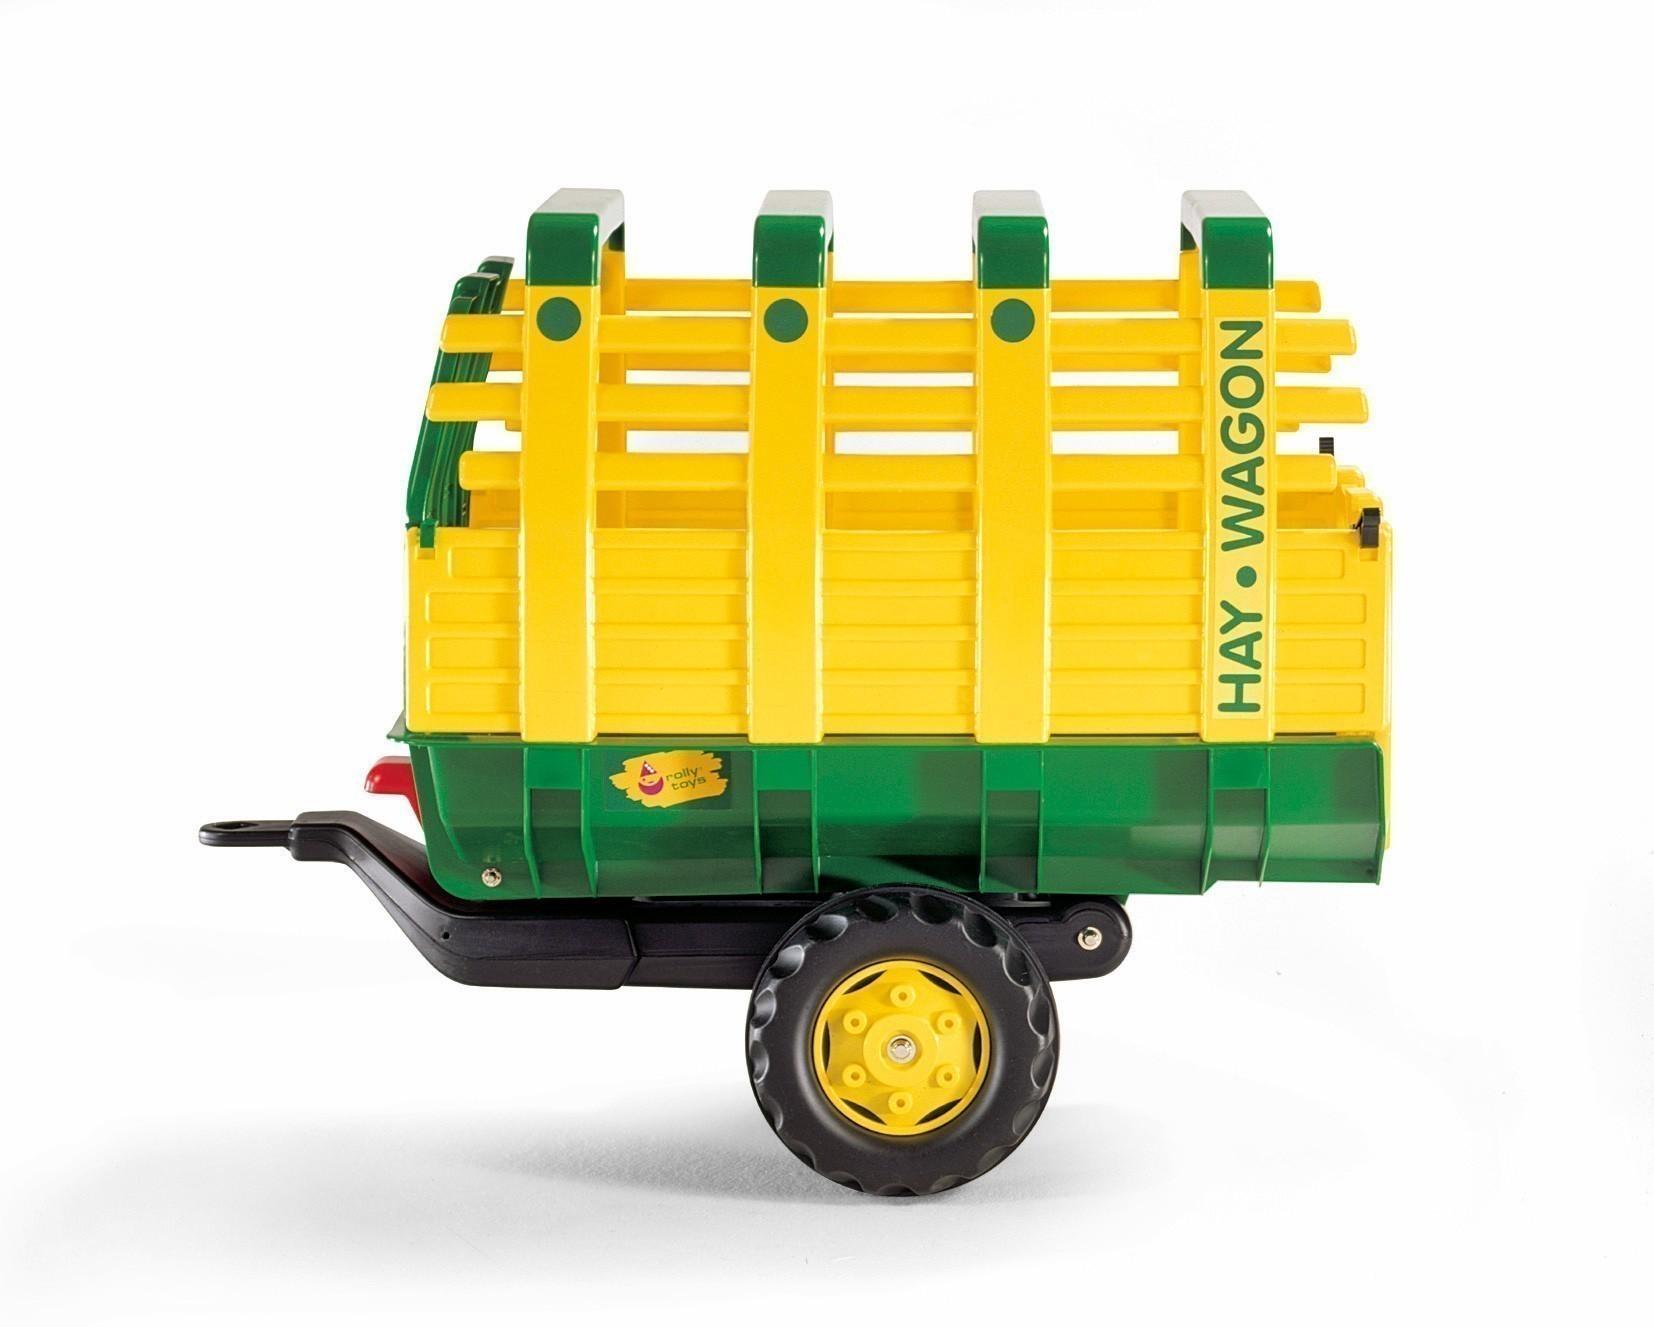 Anhänger für Tretfahrzeug rolly Hay Wagon grün / gelb - Rolly Toys Bild 1